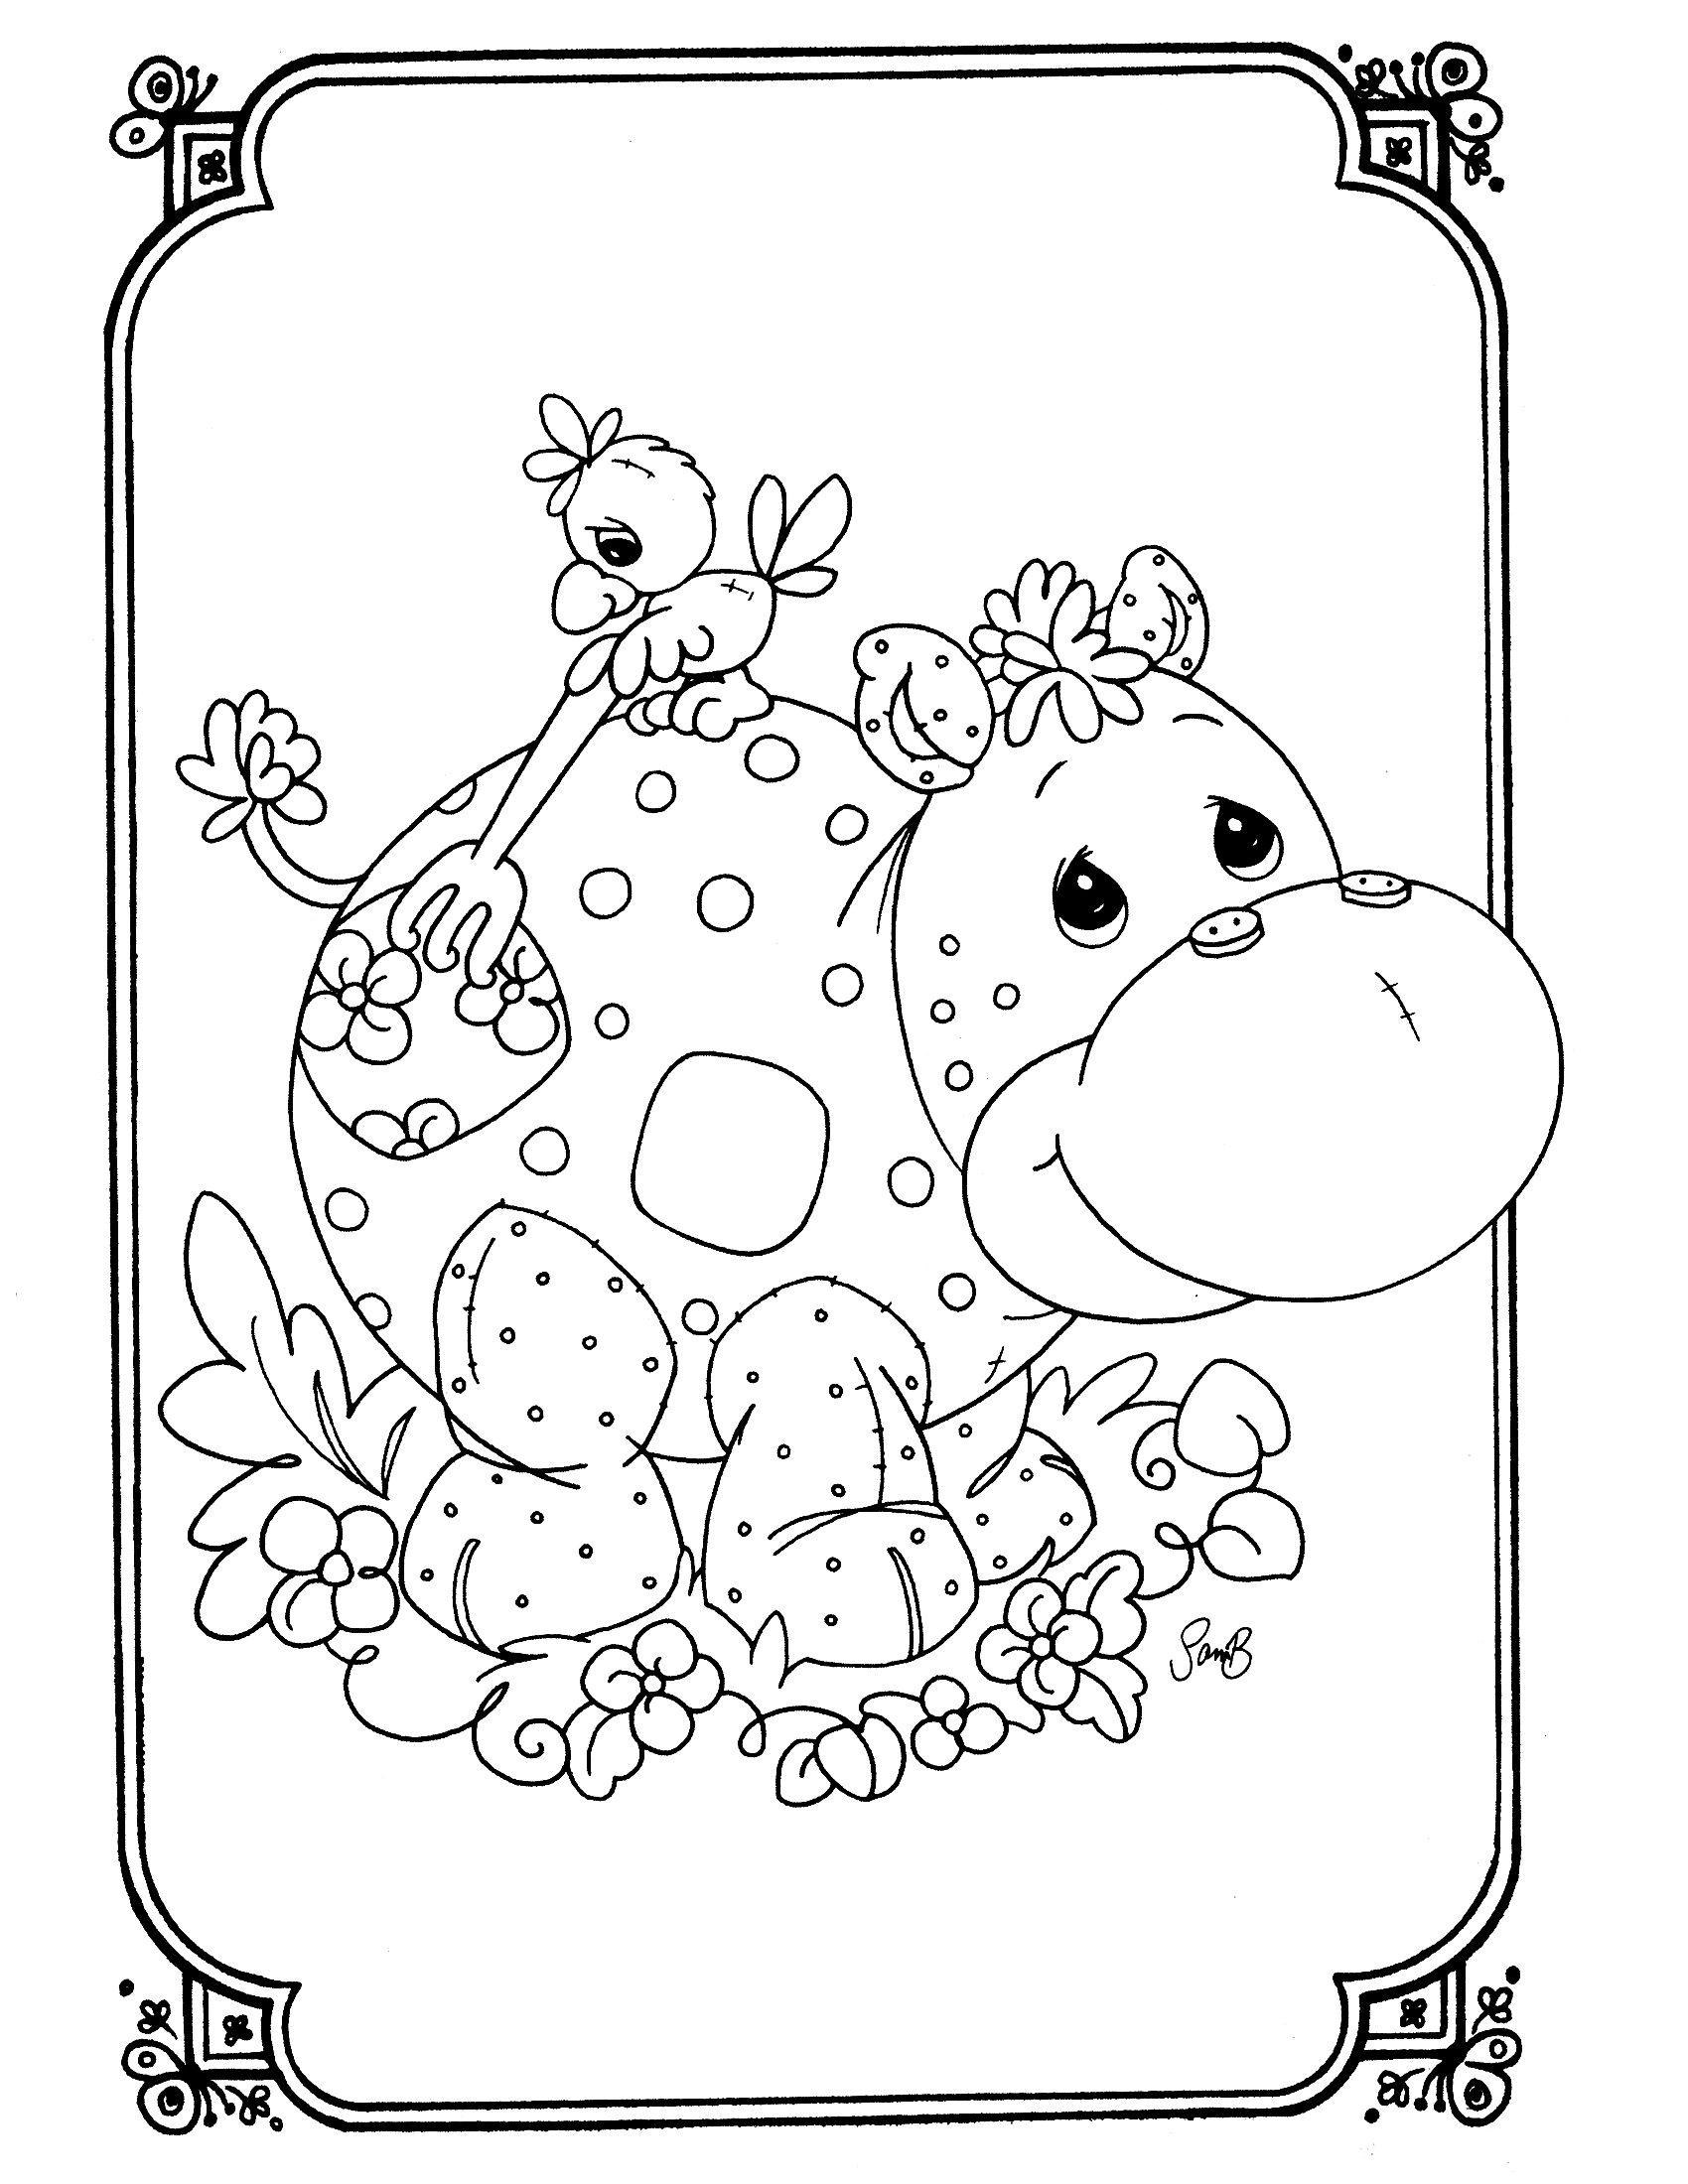 Precious Moments 19 Precious Moments Coloring Pages Coloring Books Baby Coloring Pages [ 2200 x 1700 Pixel ]